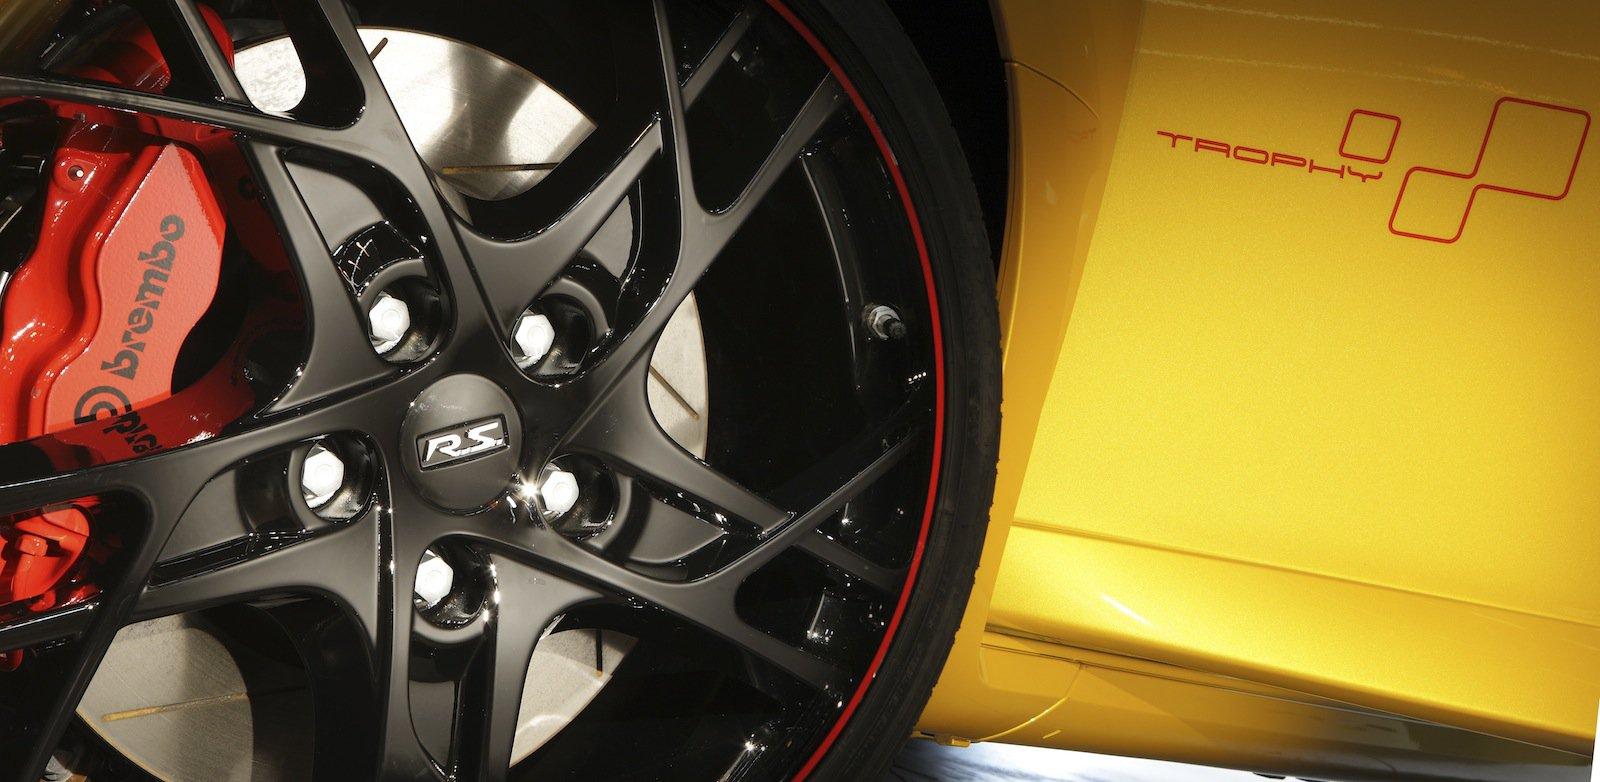 Renault Sport Wallpapers, Vehicles, HQ Renault Sport